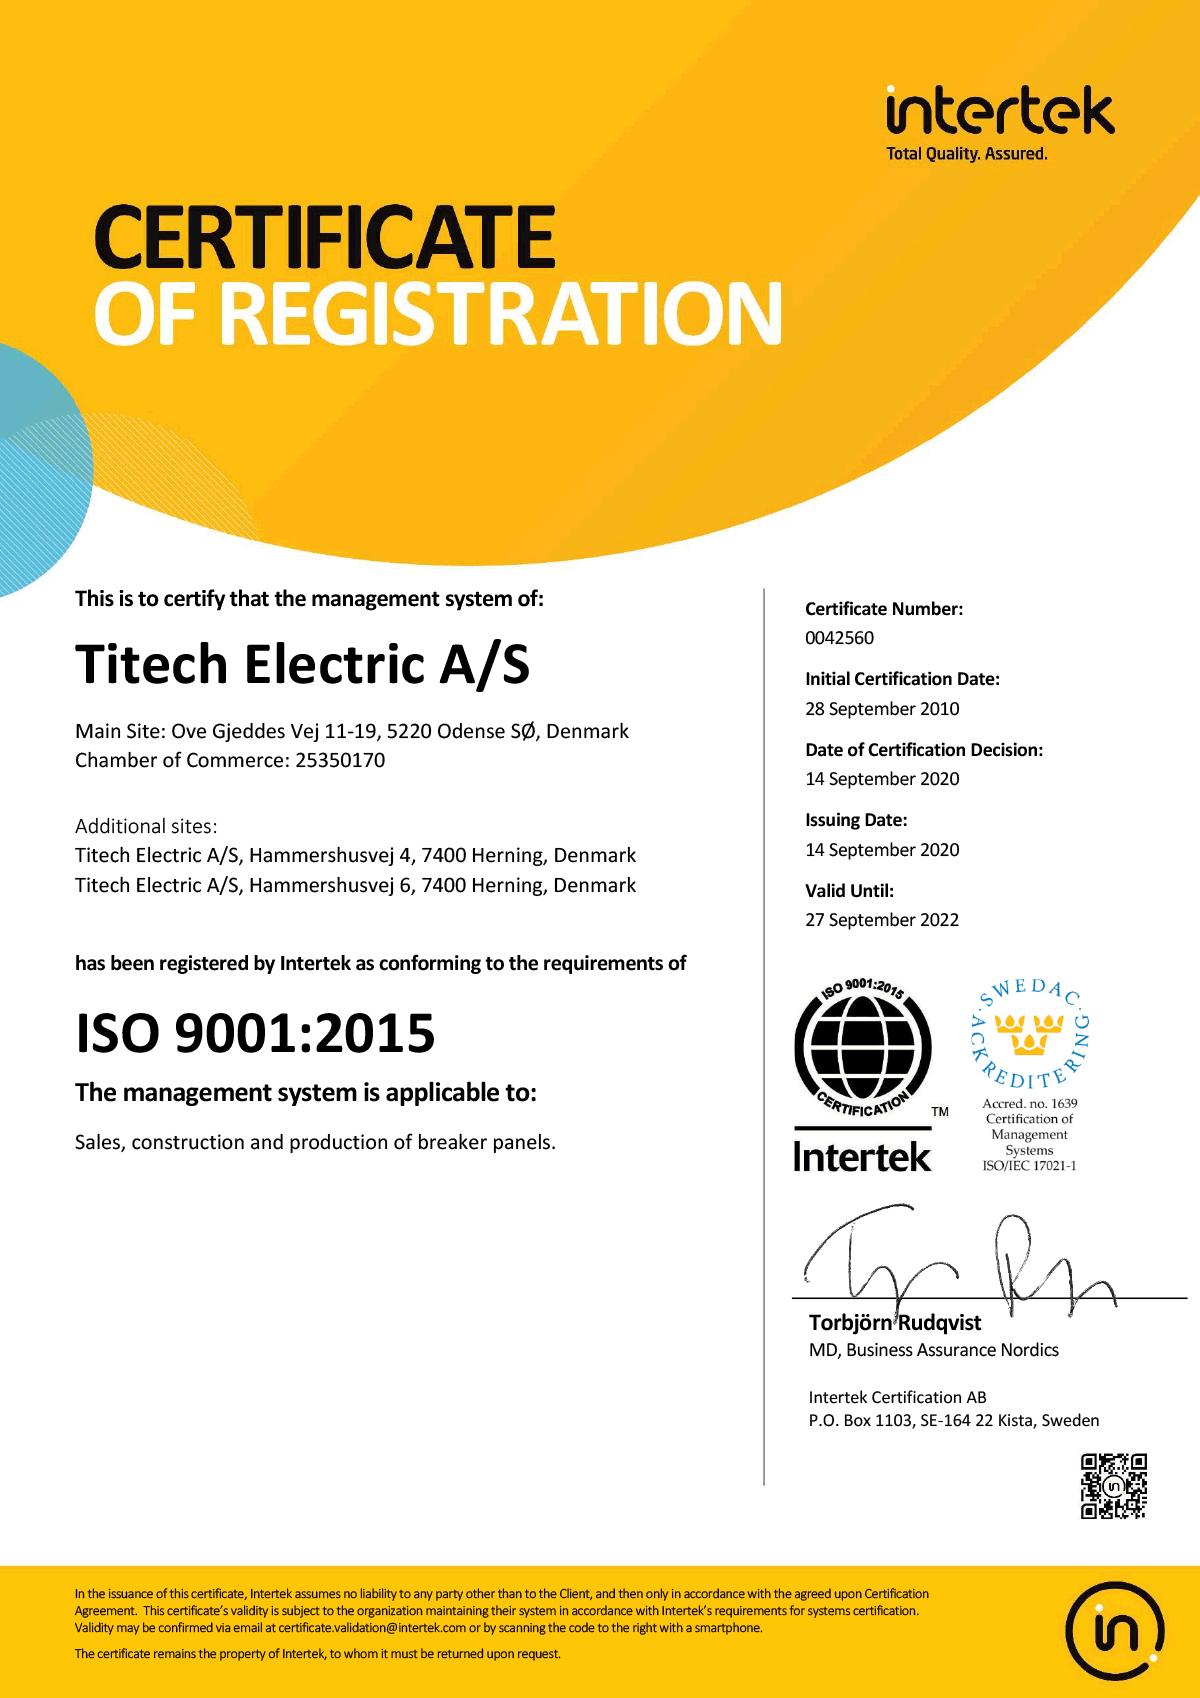 2016-certifikat-9001-en-5-10-16